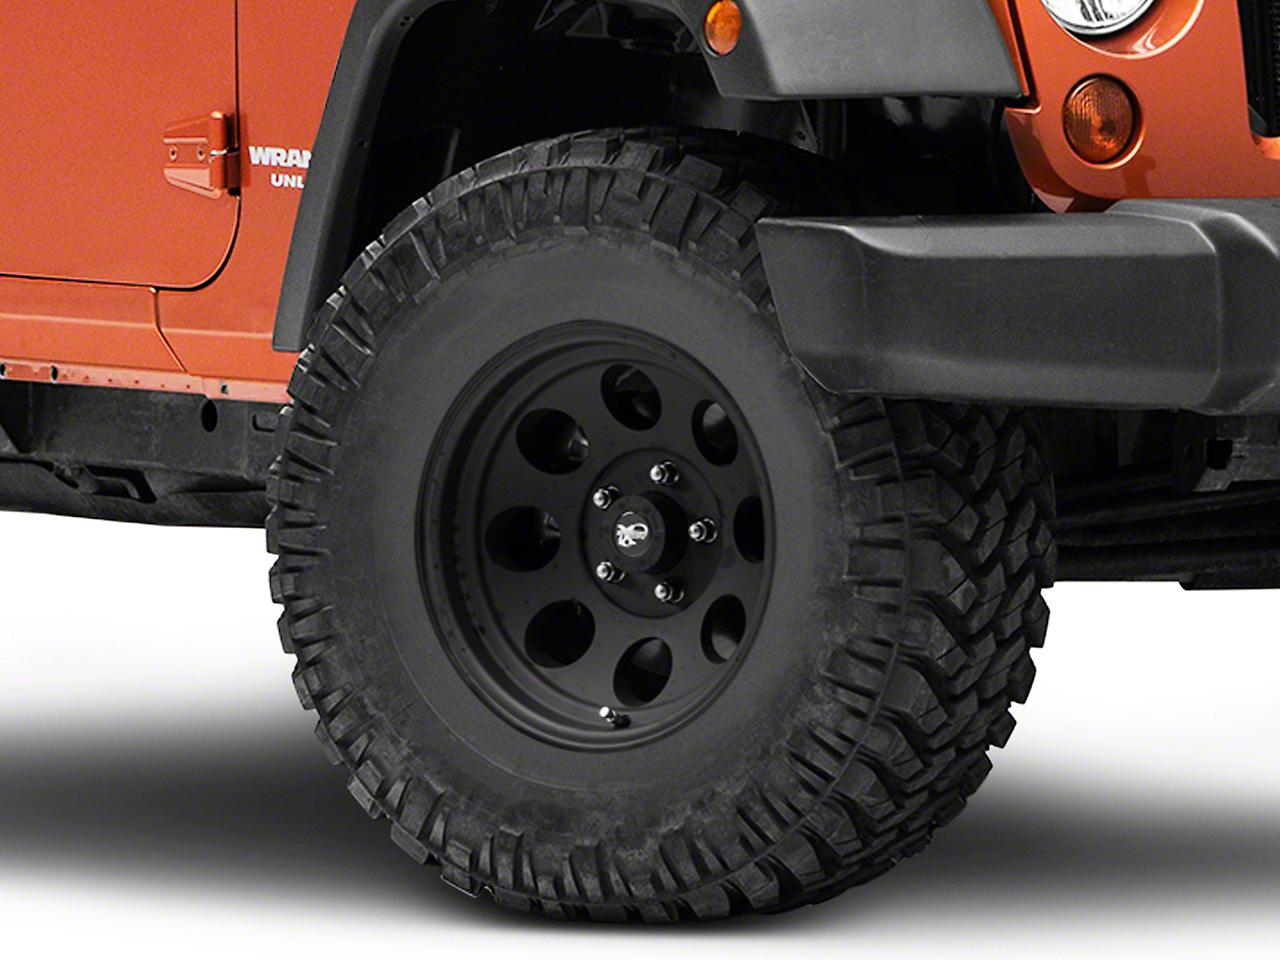 Pro Comp Alloy Series 7069 Flat Black Wheel - 16x8 (07-18 Wrangler JK; 2018 Wrangler JL)